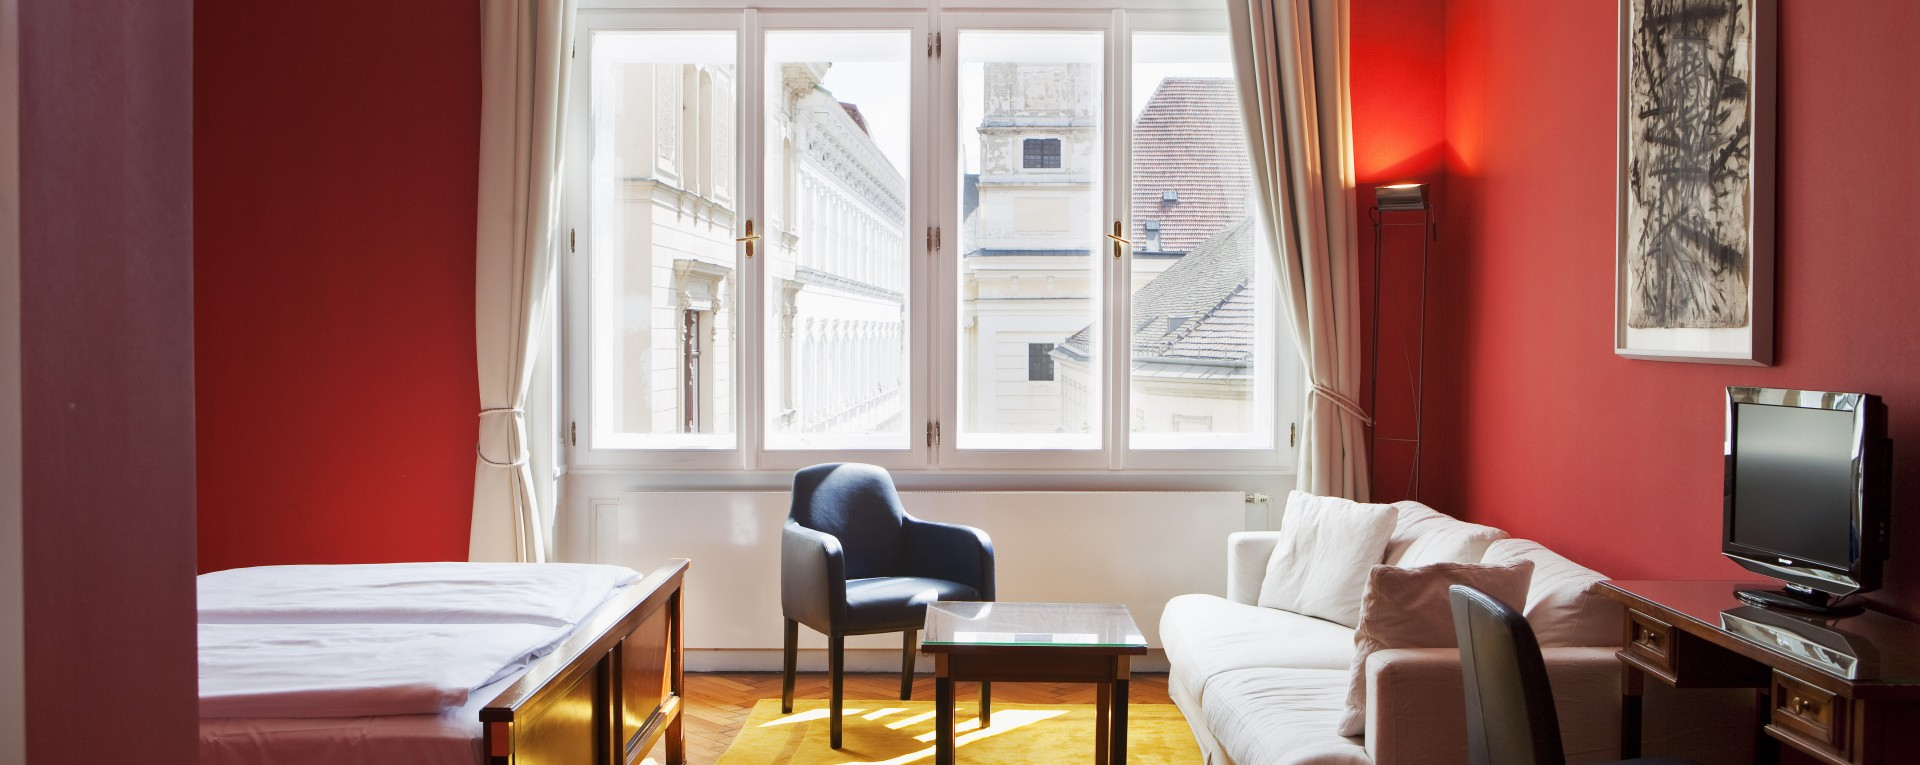 altstadt hotel vienna austria europe luxury short breaks kirker holidays kirker holidays. Black Bedroom Furniture Sets. Home Design Ideas